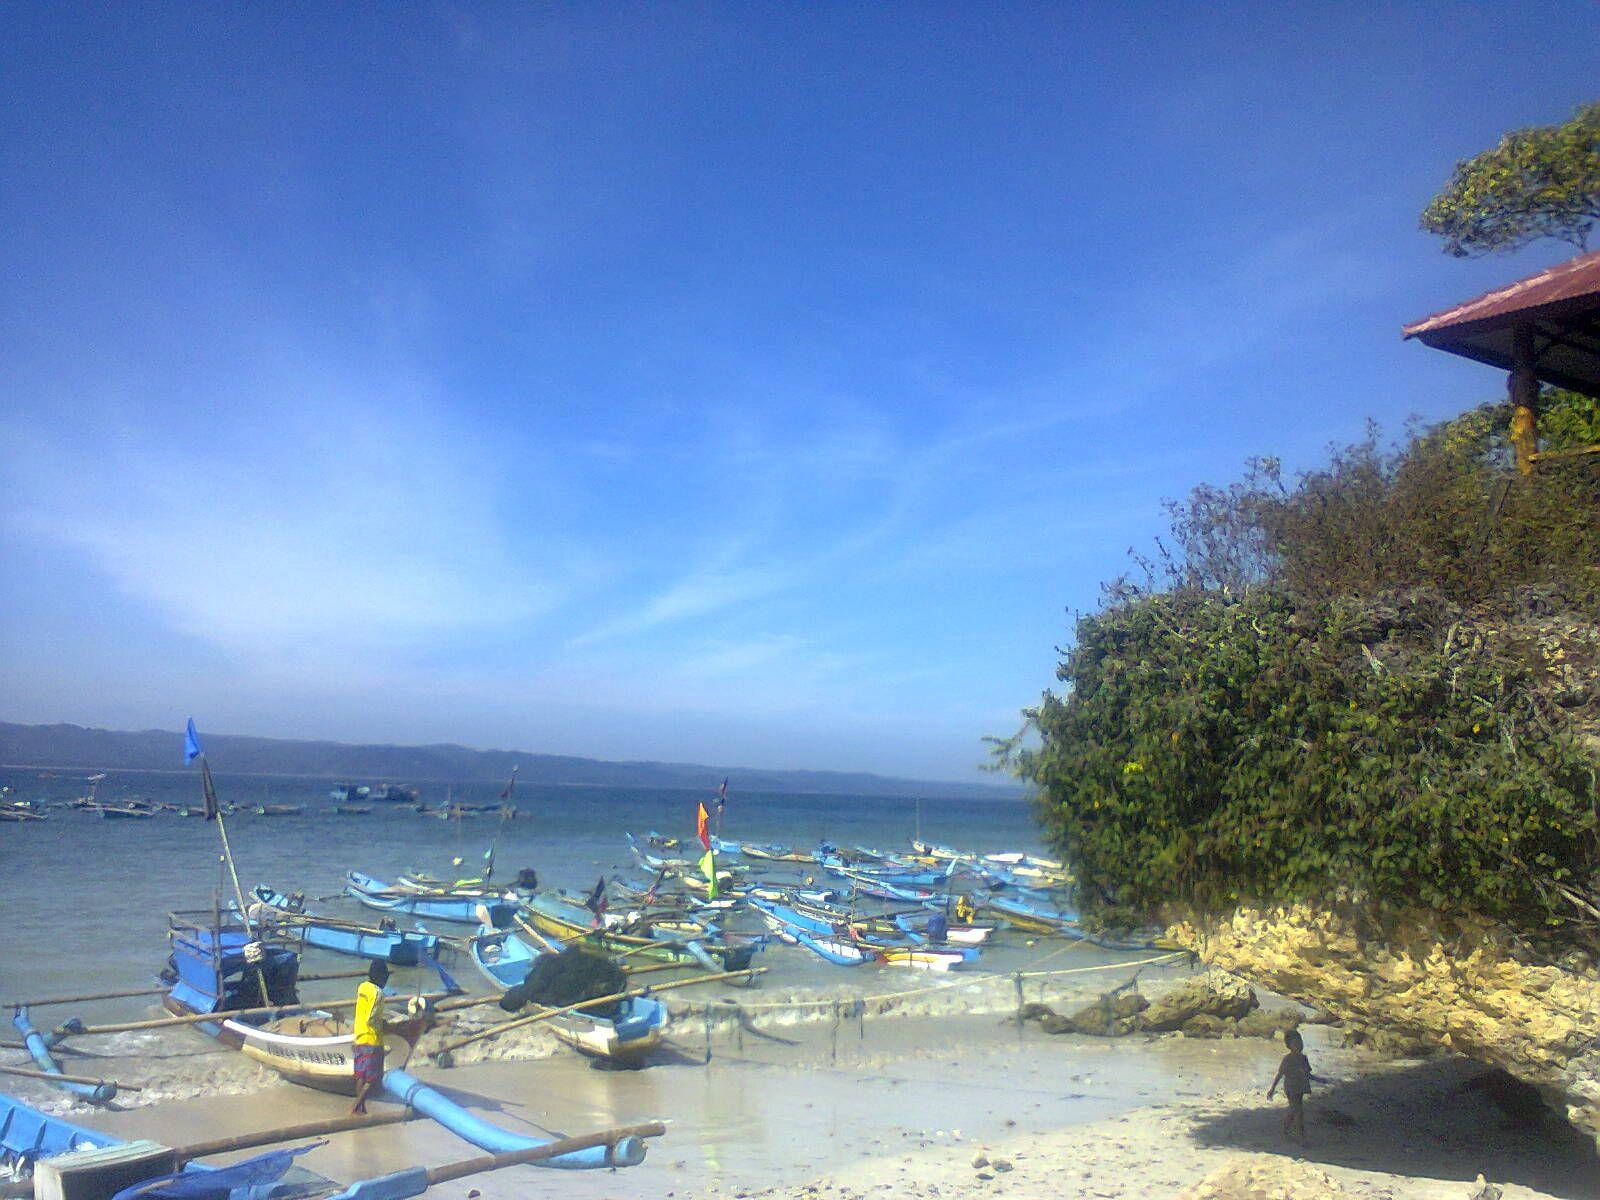 Dari Sudut Pantai Timur Pangandaran Tempat Parkir Para Perahu